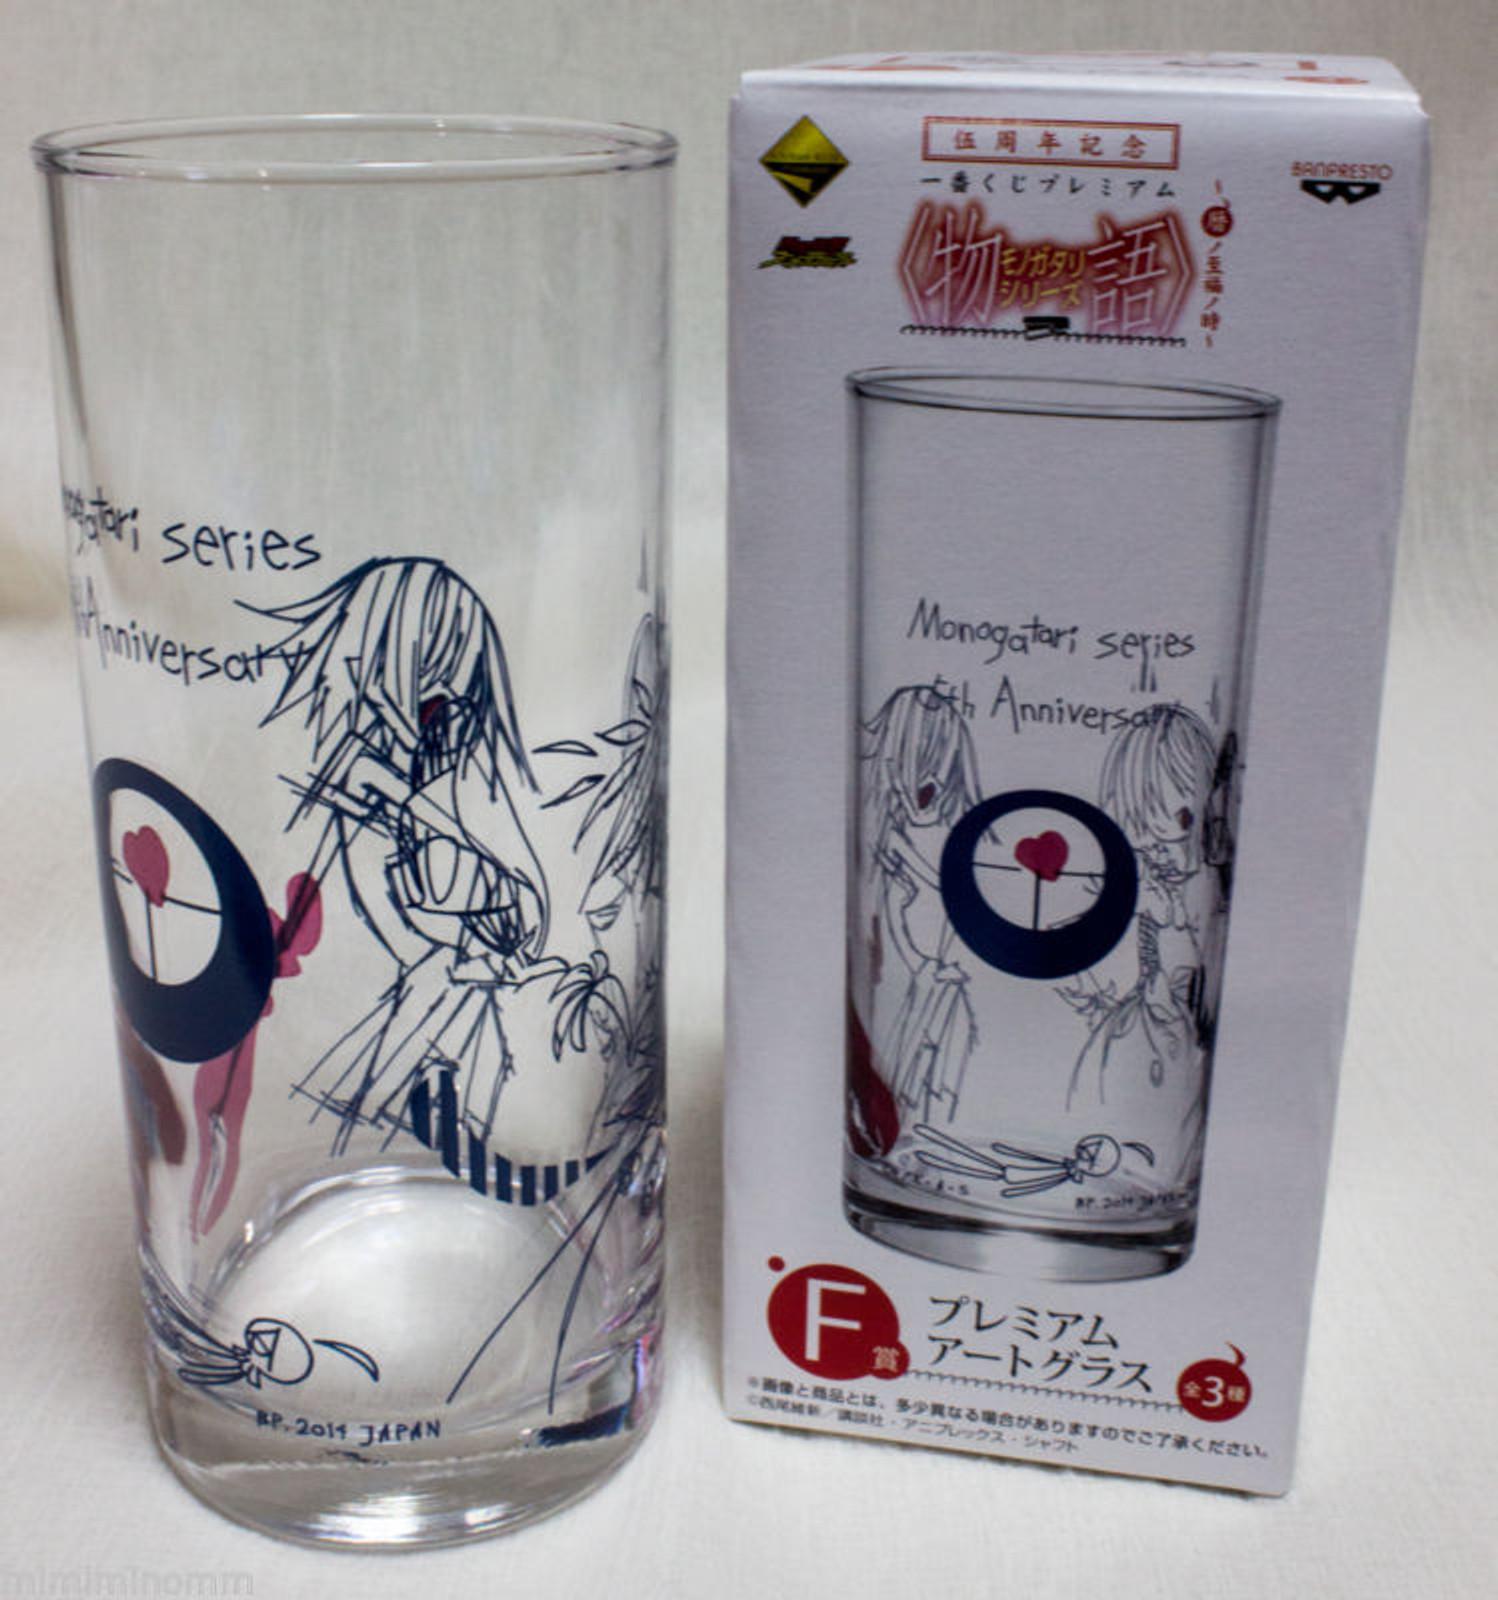 Monogatari Series Premium Art Glass 5th Anniversary 2 [ Sueuga / Tsubasa ] JAPAN ANIME